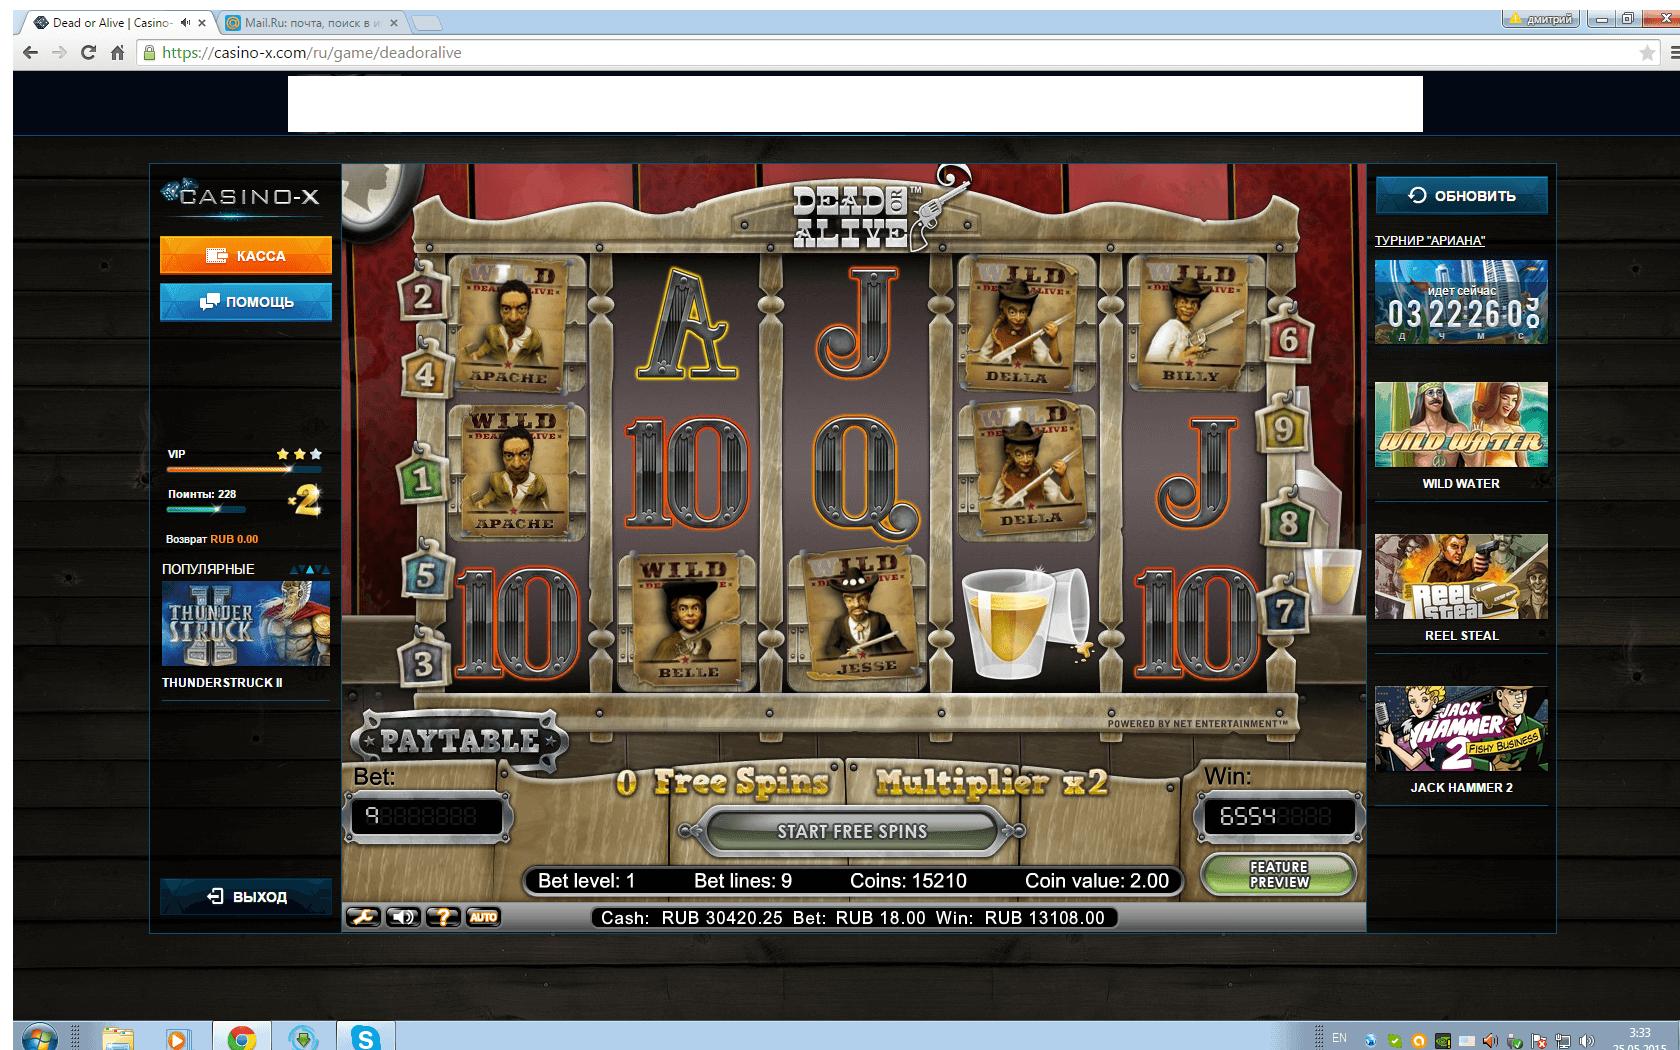 http casino x